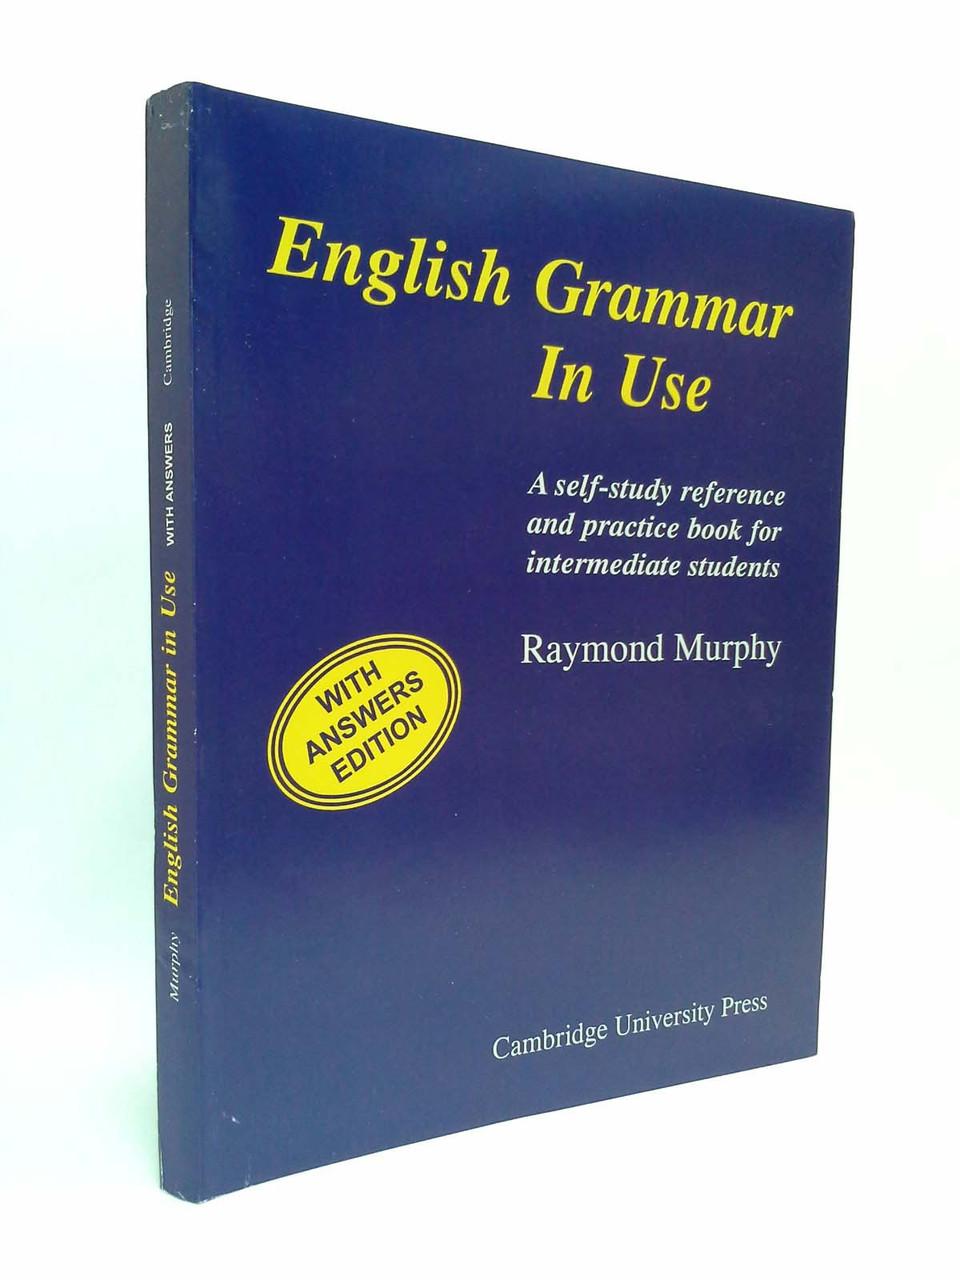 Граматика Англ грамматика (синяя) Мерфи Кембридж